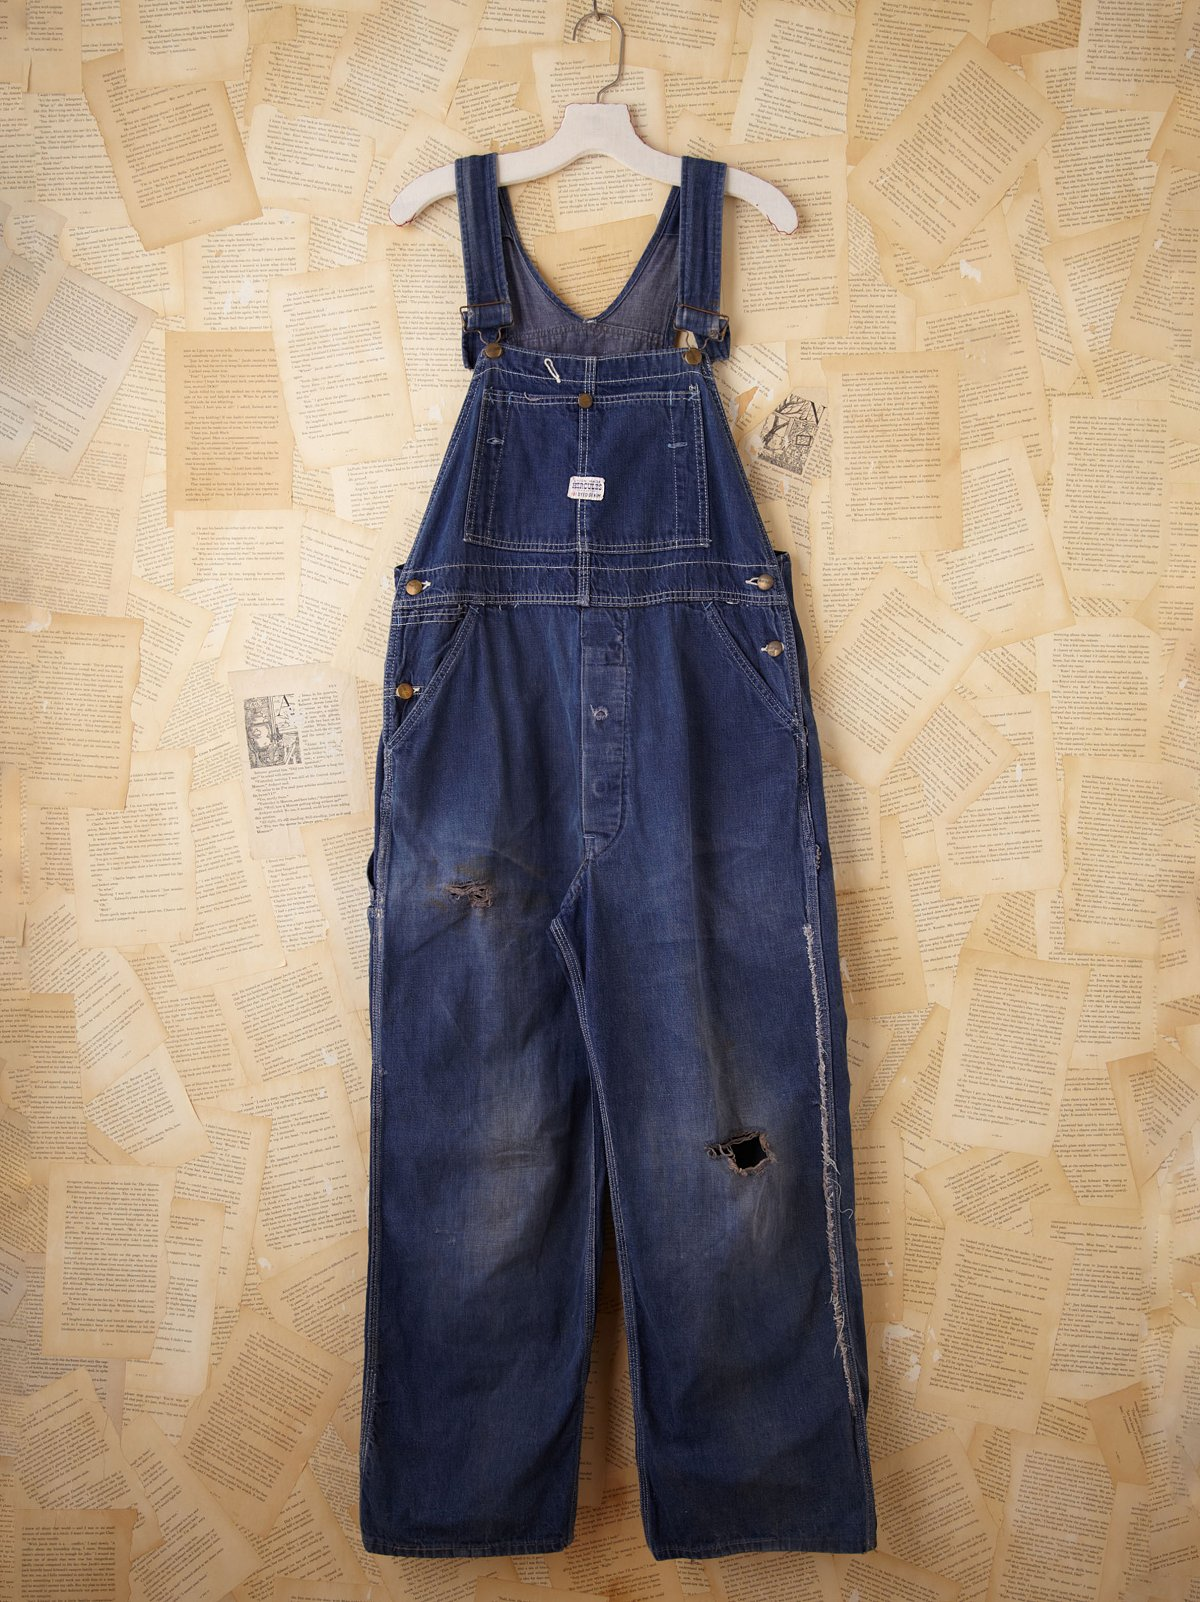 Vintage Denim Bib Overalls